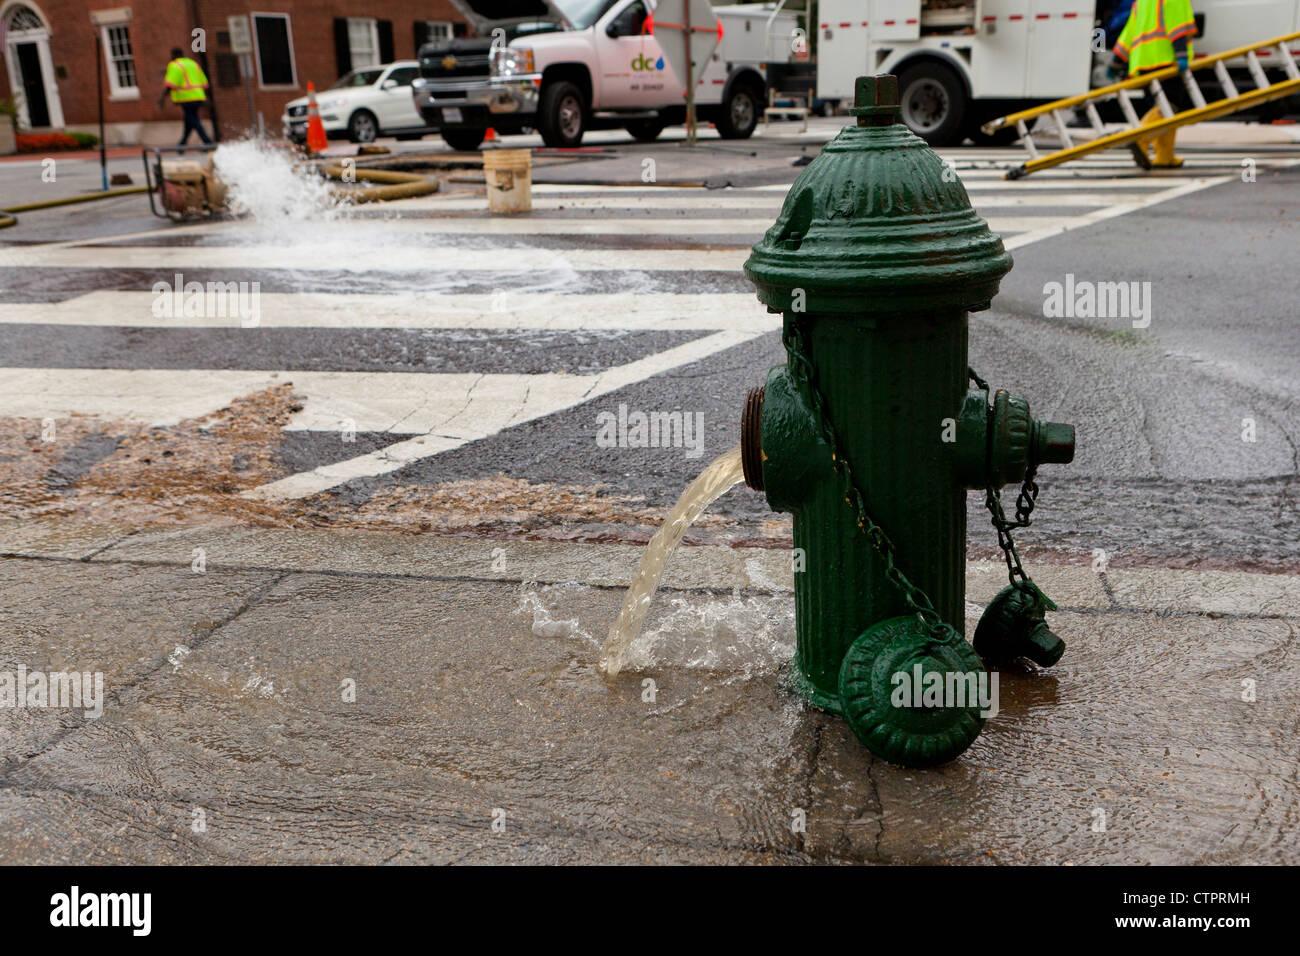 Open fire hydrant - Washington, DC USA - Stock Image